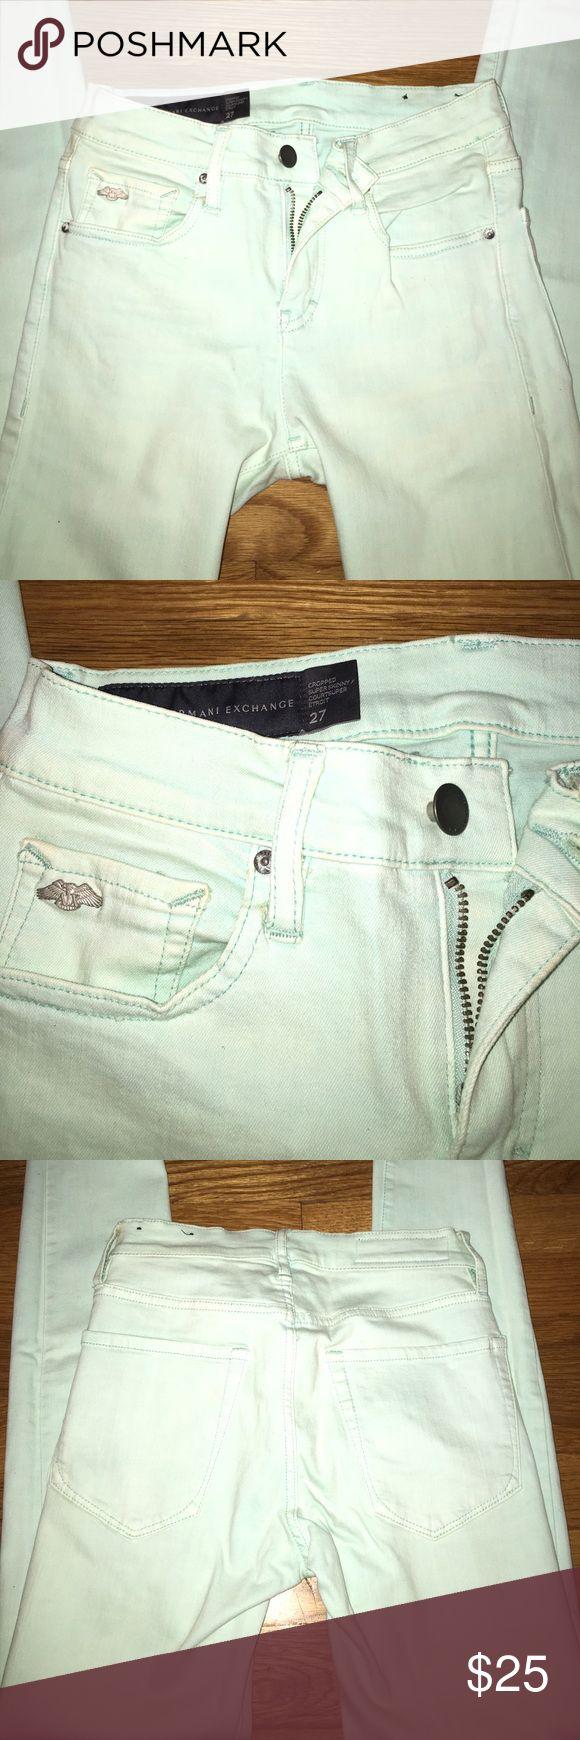 Armani Exchange AQUA summer aqua jeans Armani Exchange AQUA summer aqua jeans Armani Exchange Jeans Skinny